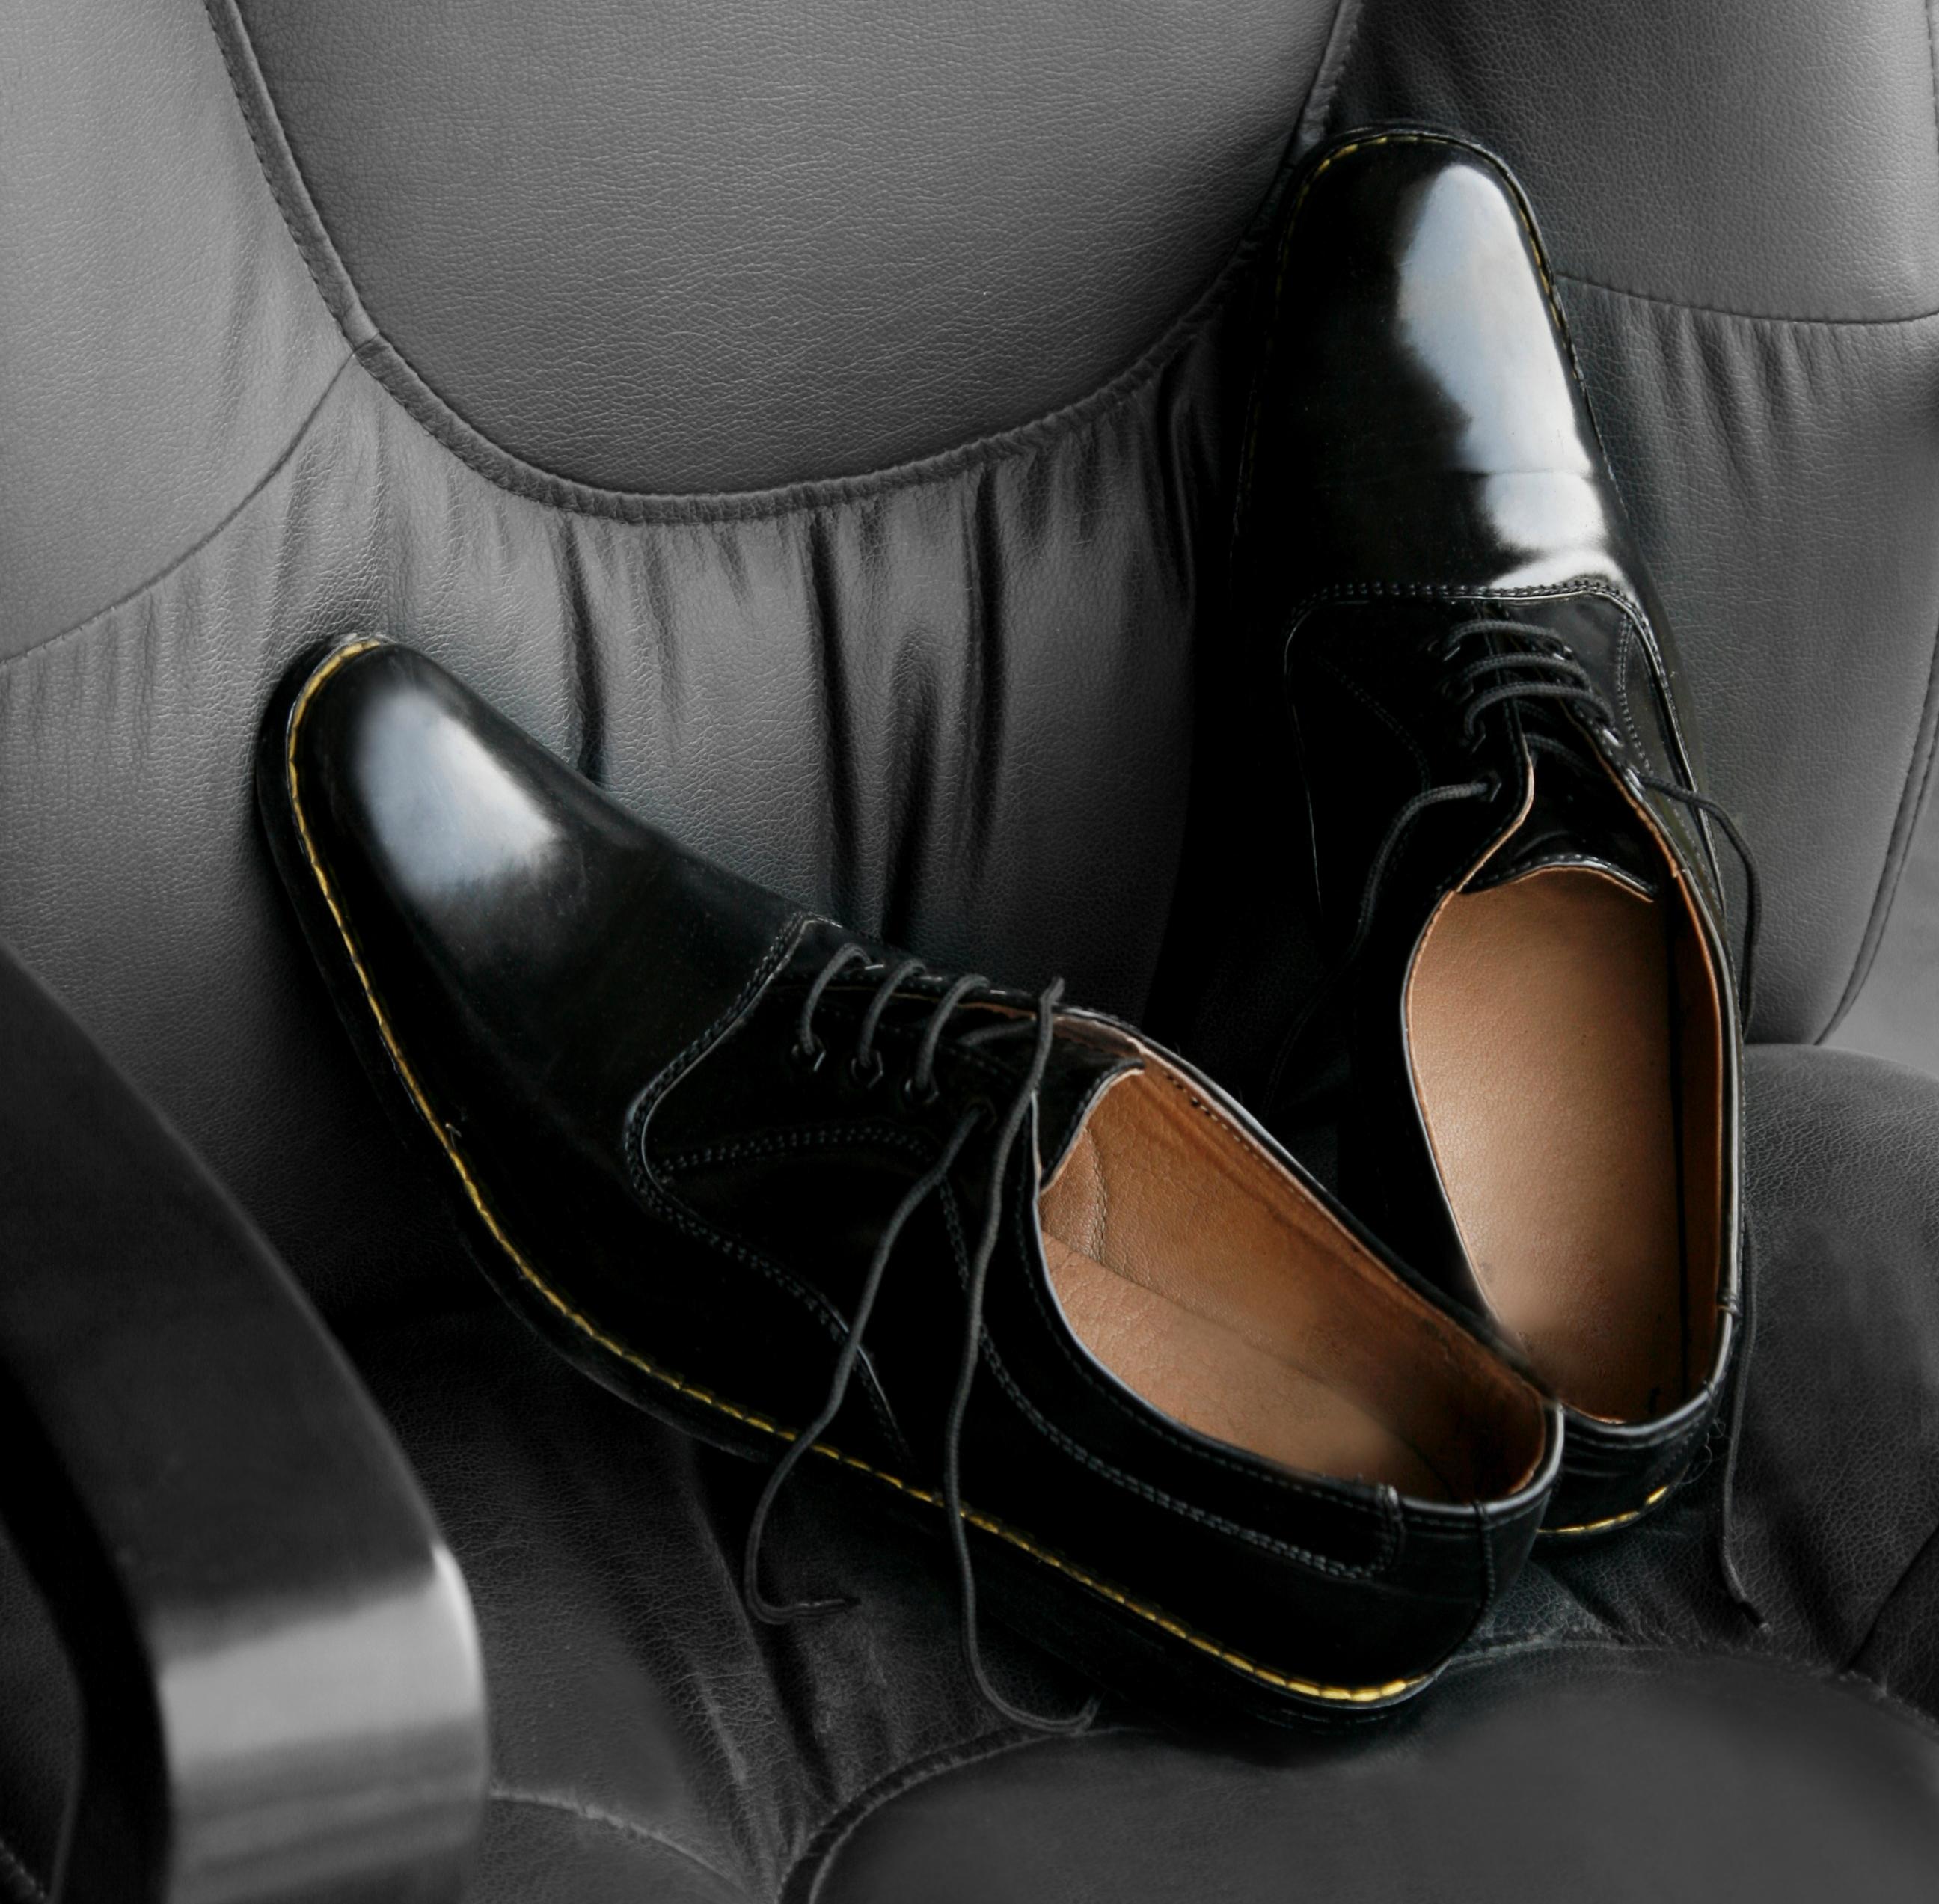 SWATI MODO - The Perfect Black Oxford Pair